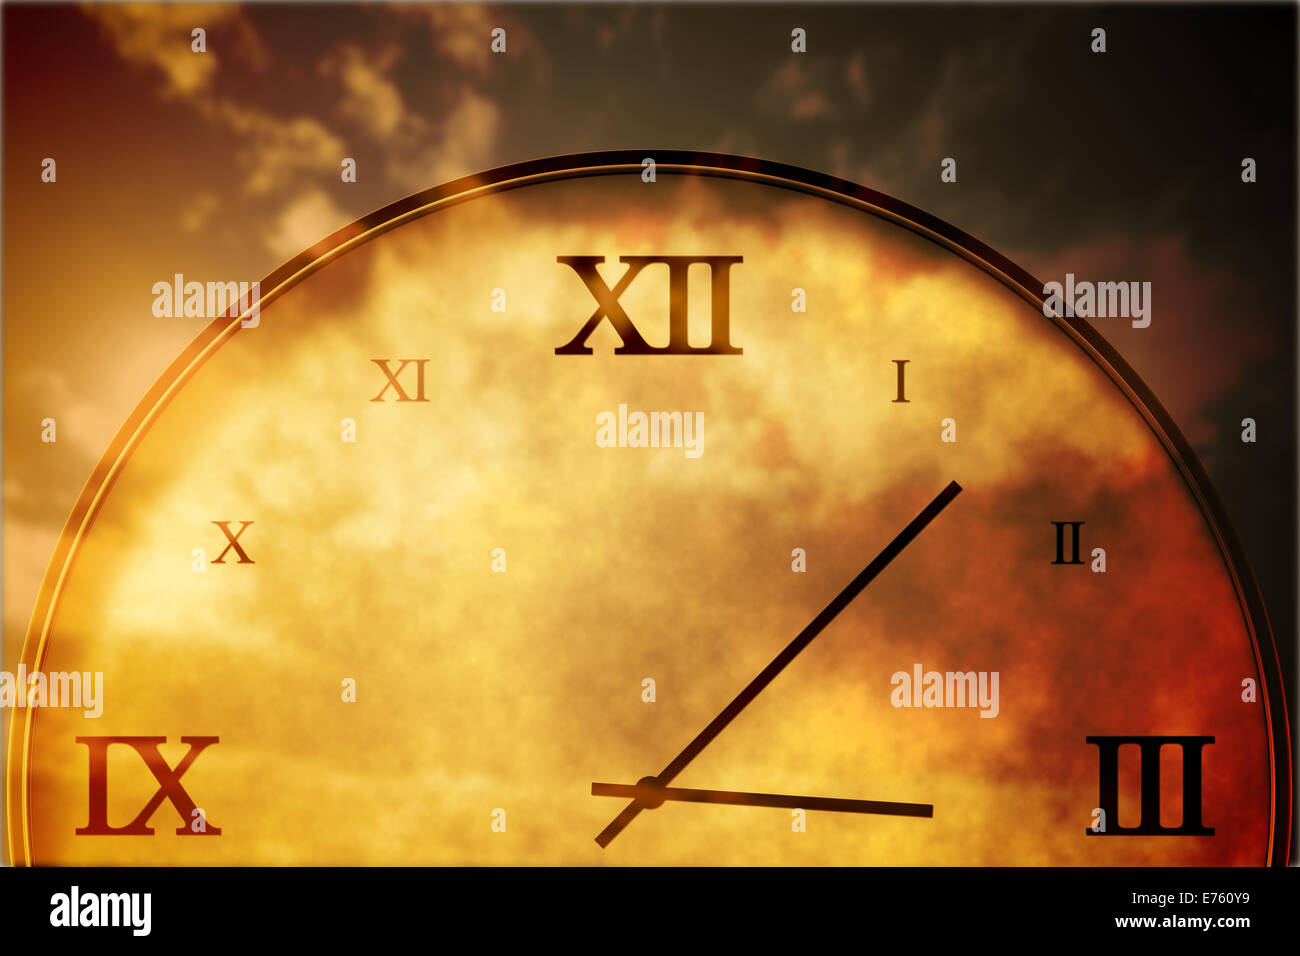 Digitally generated roman numeral clock - Stock Image